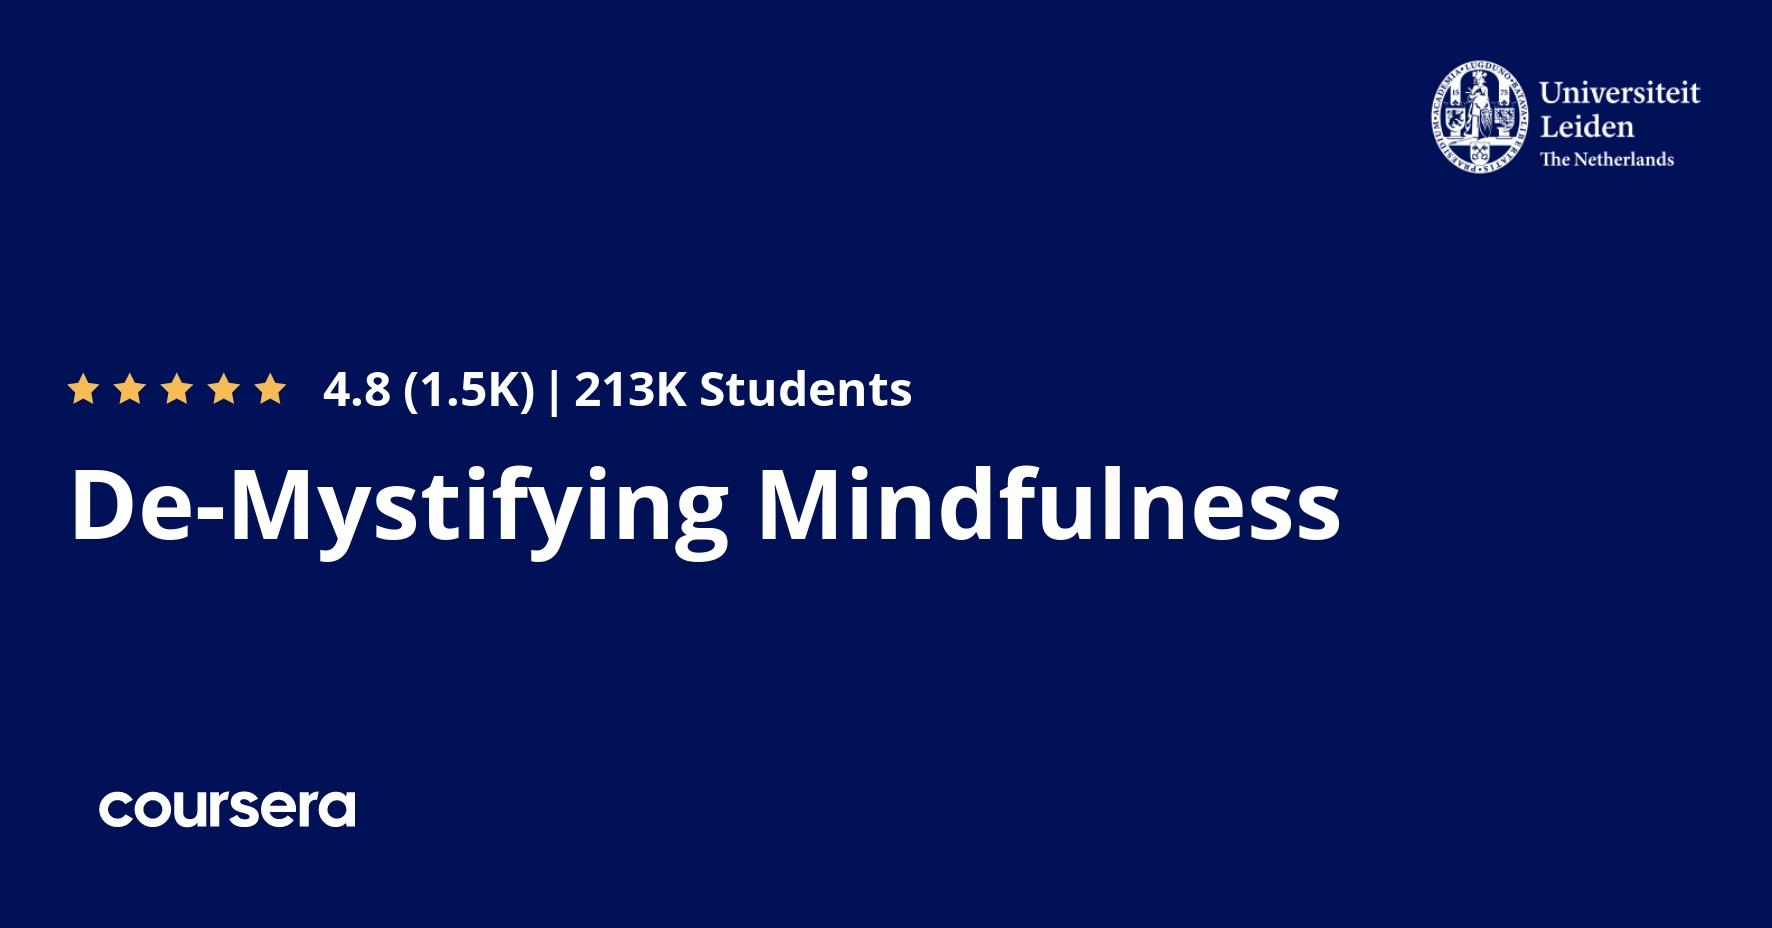 De-Mystifying Mindfulness | Coursera